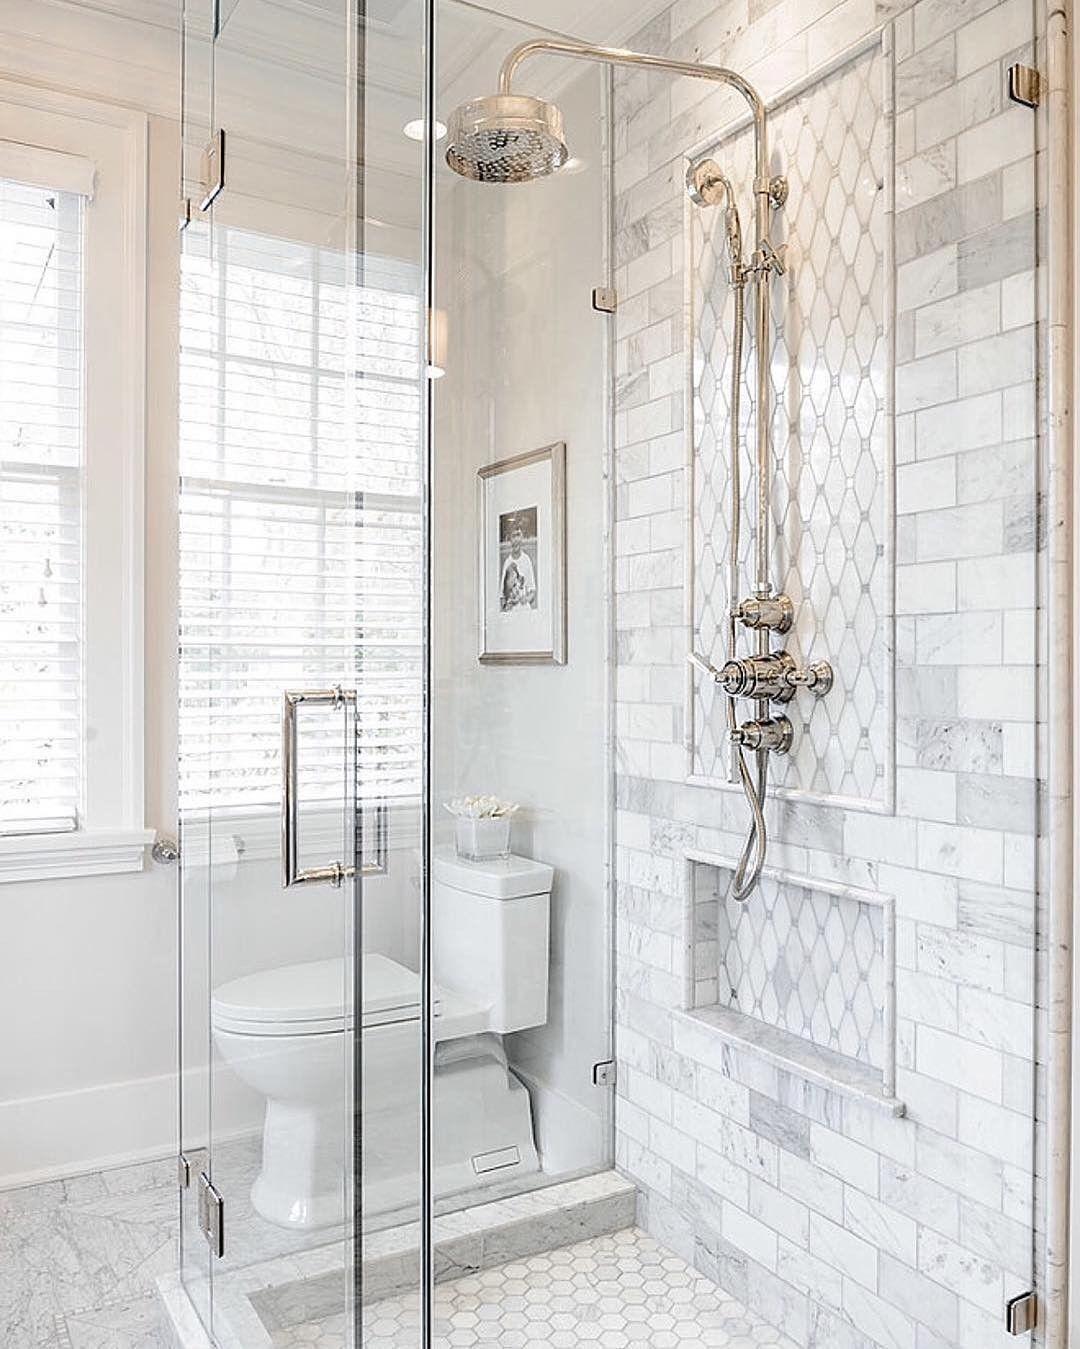 Pin by Julia Ryan on Bathrooms | Pinterest | Bath, Master bathrooms ...